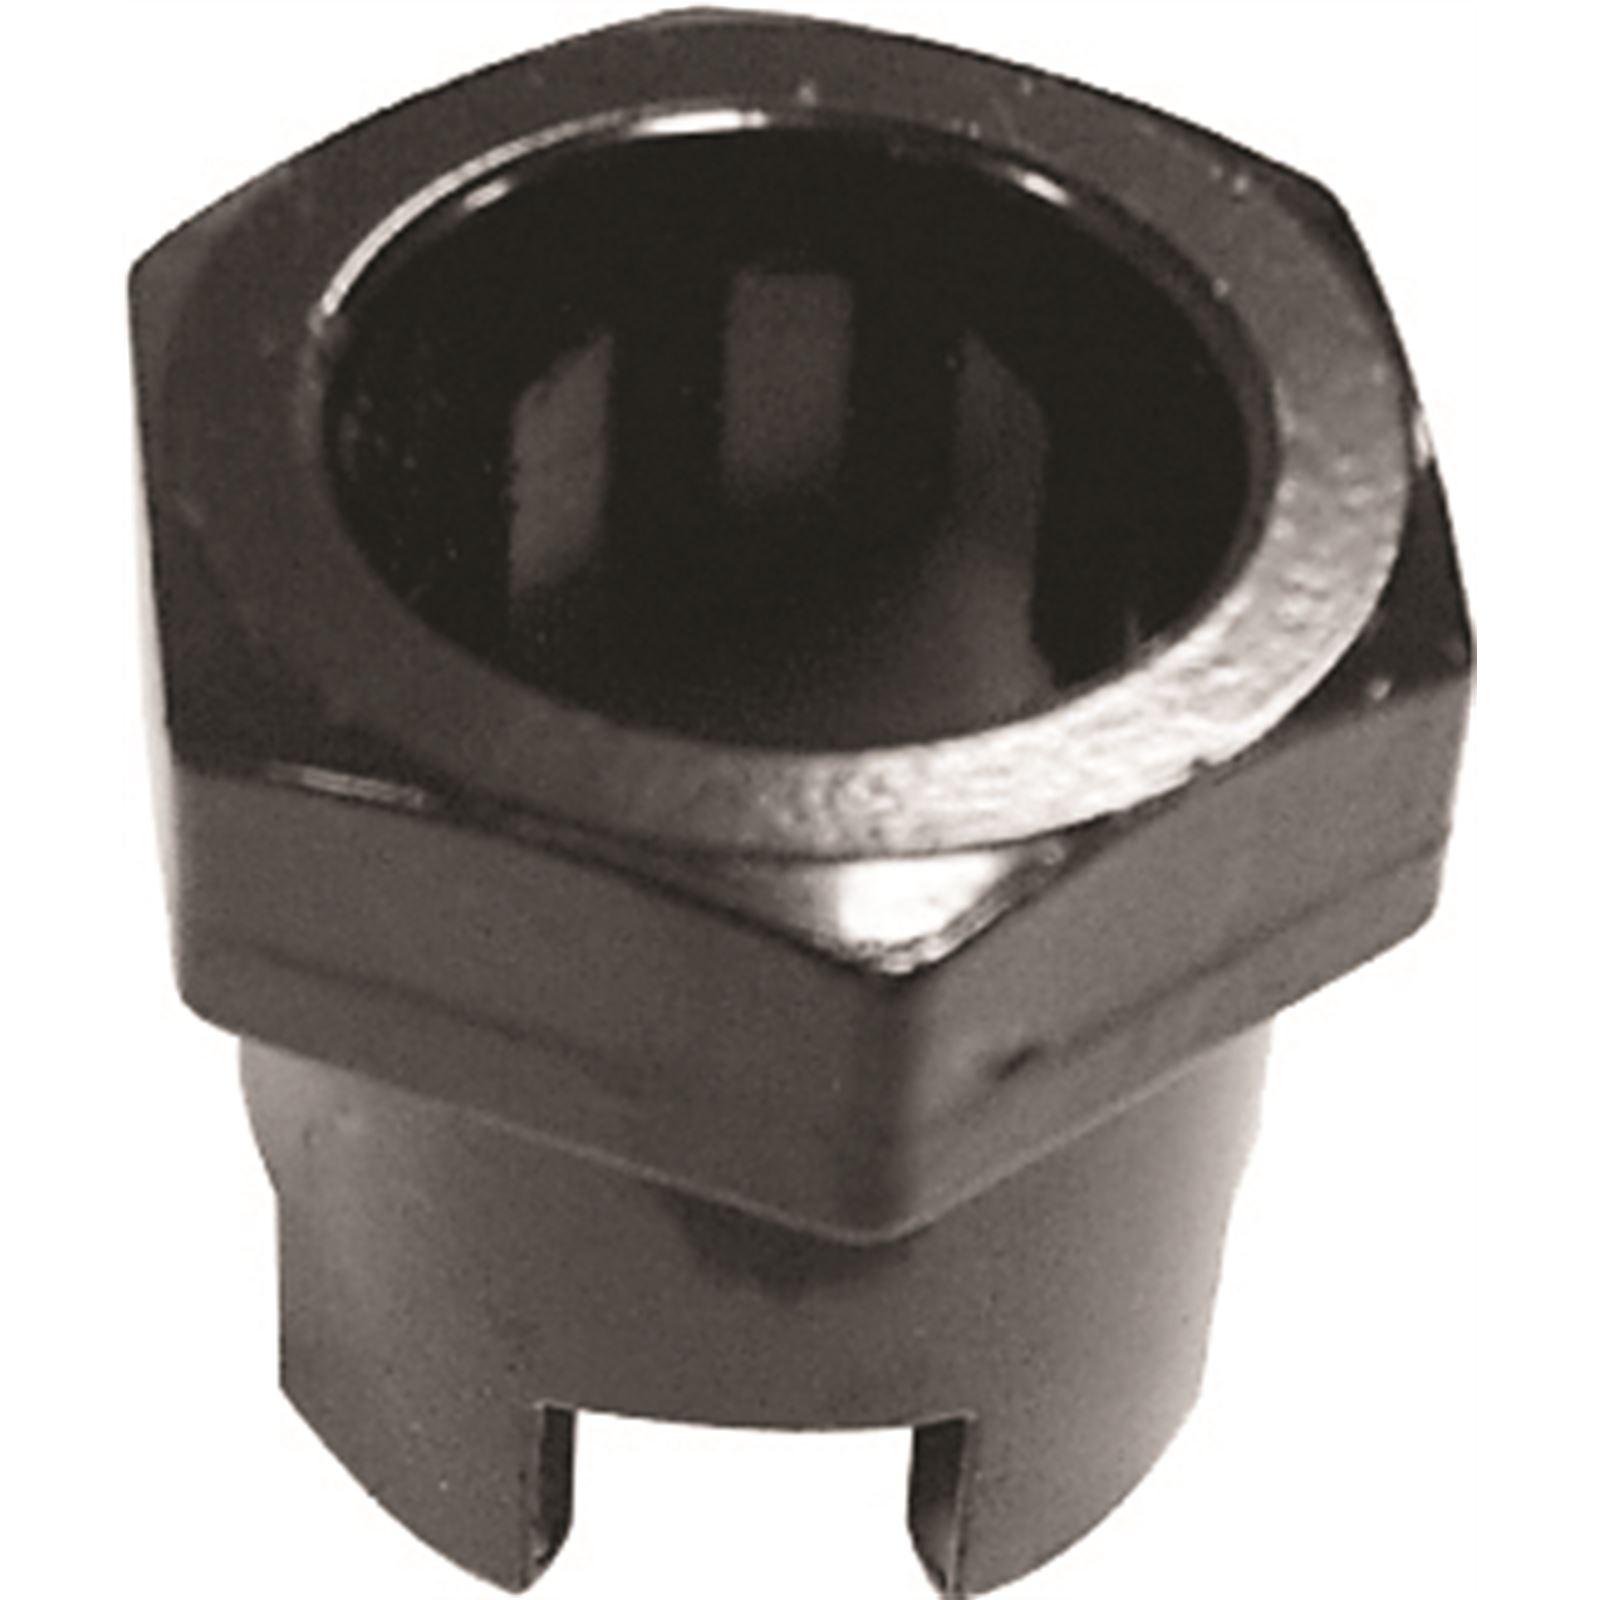 Solas Impeller Wrench